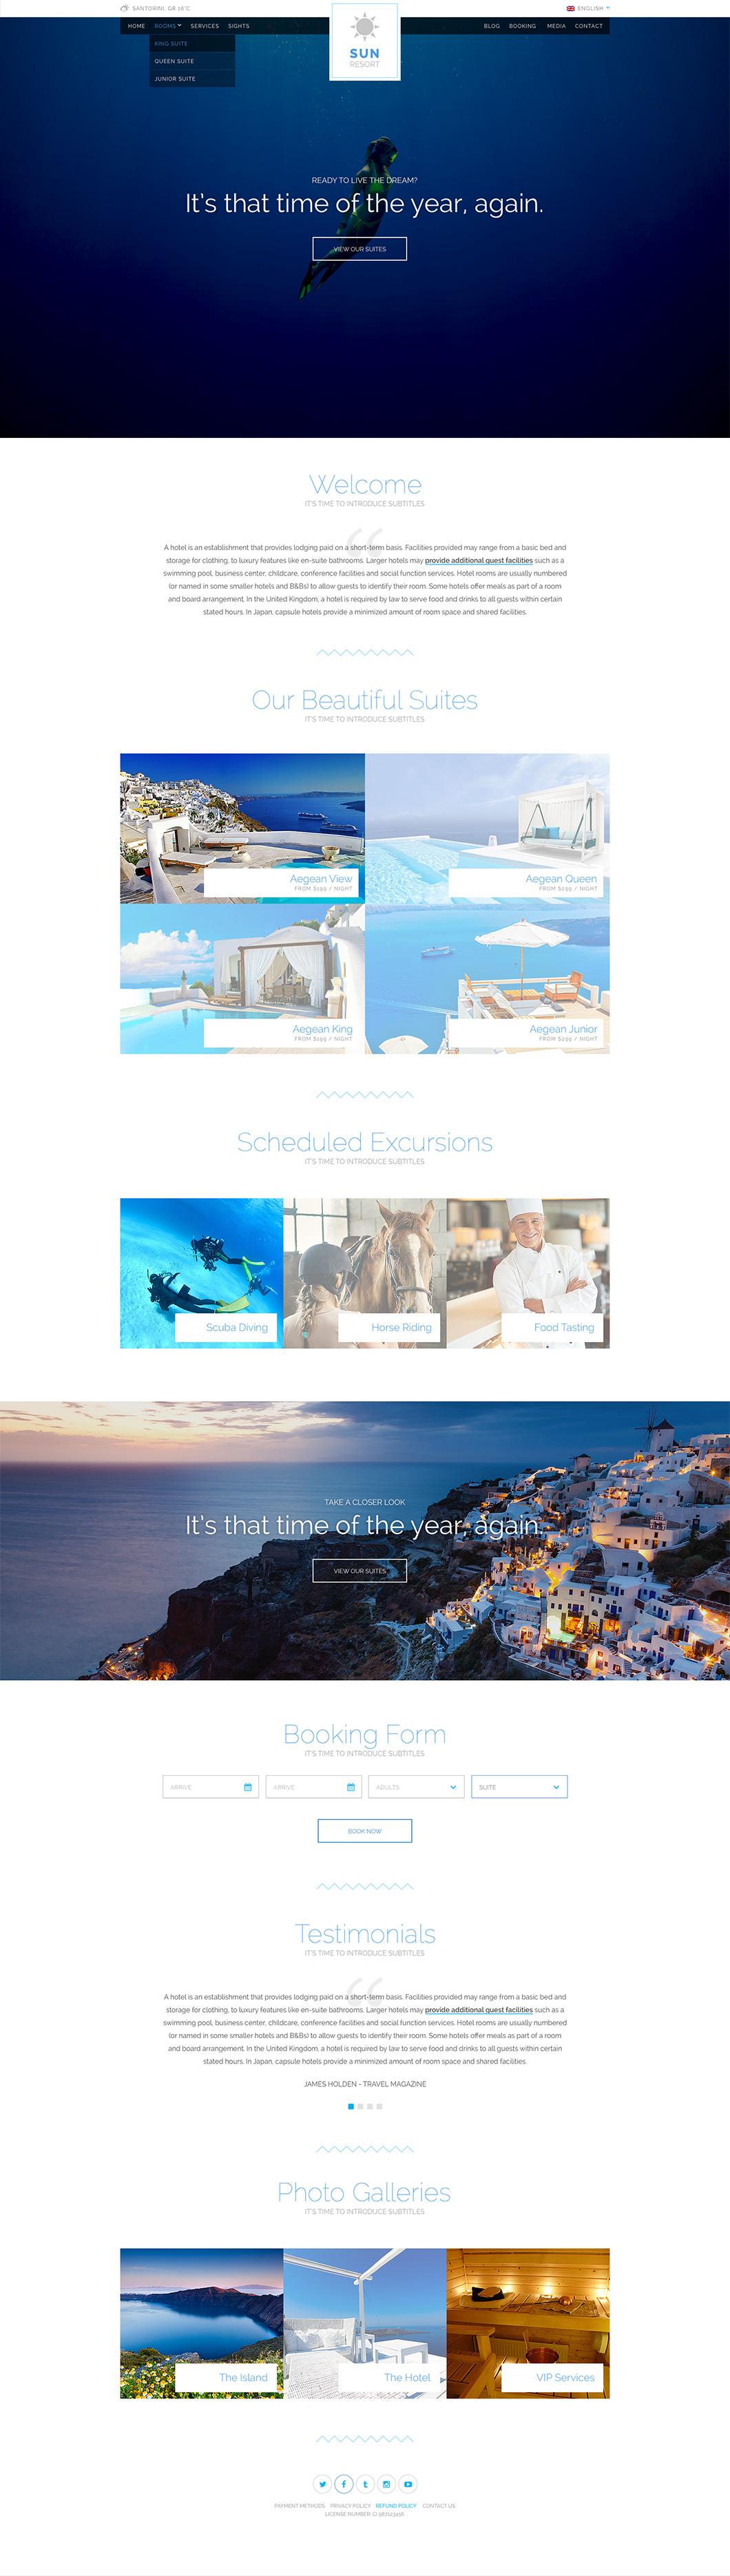 sun_resort_home